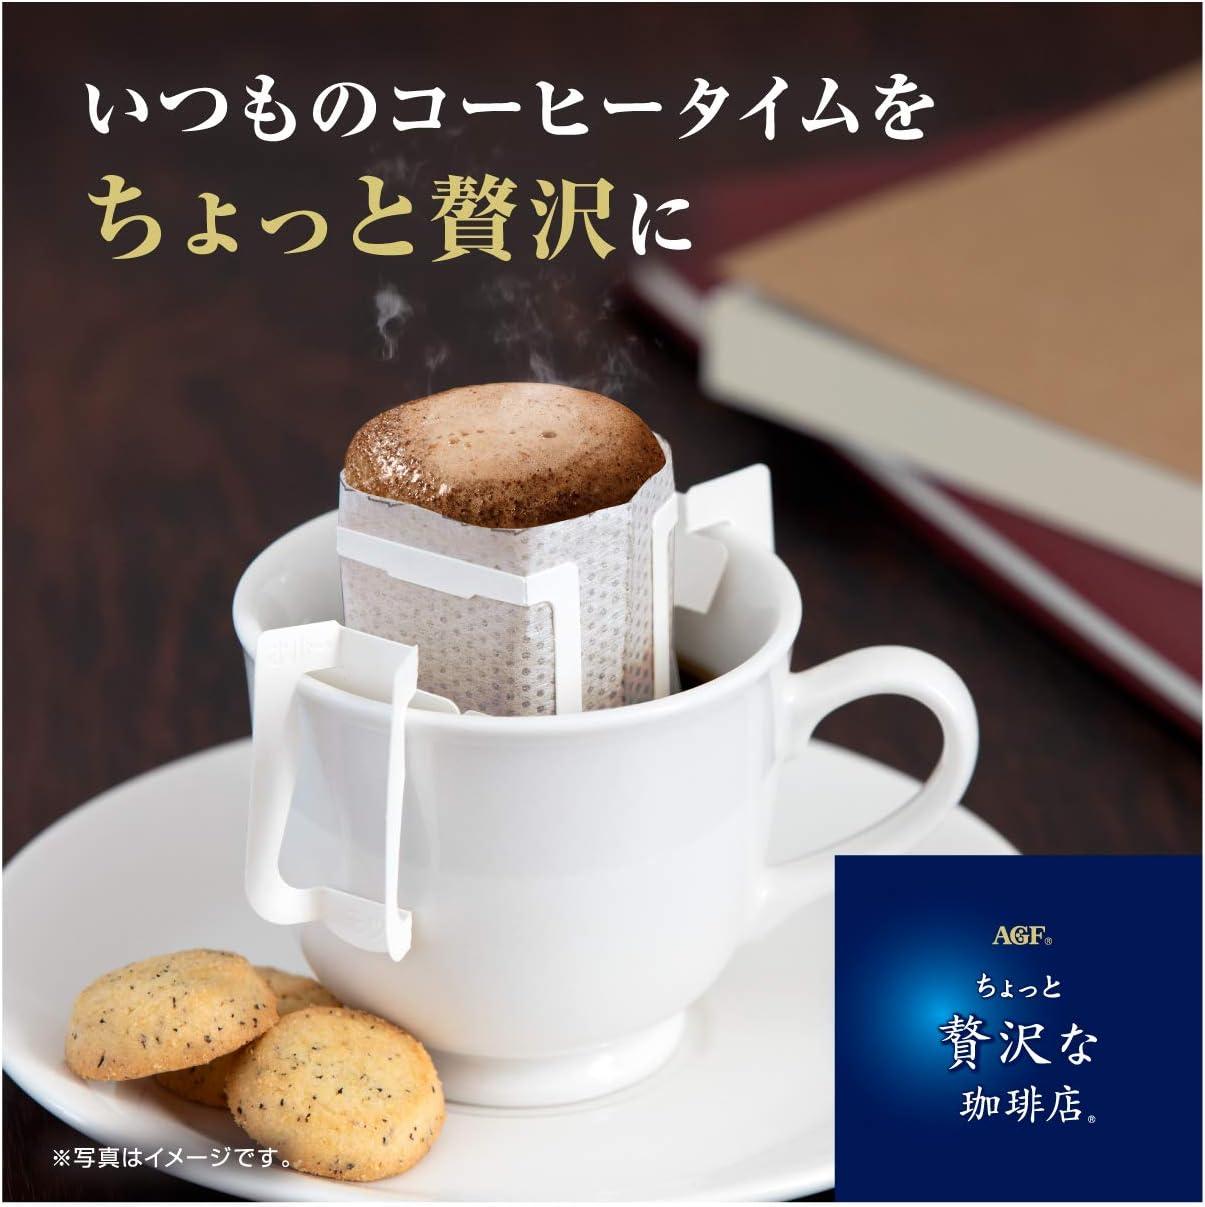 AGF ちょっと贅沢な珈琲店 レギュラーコーヒー ドリップパック アソート 40袋 【 ドリップコーヒー 】